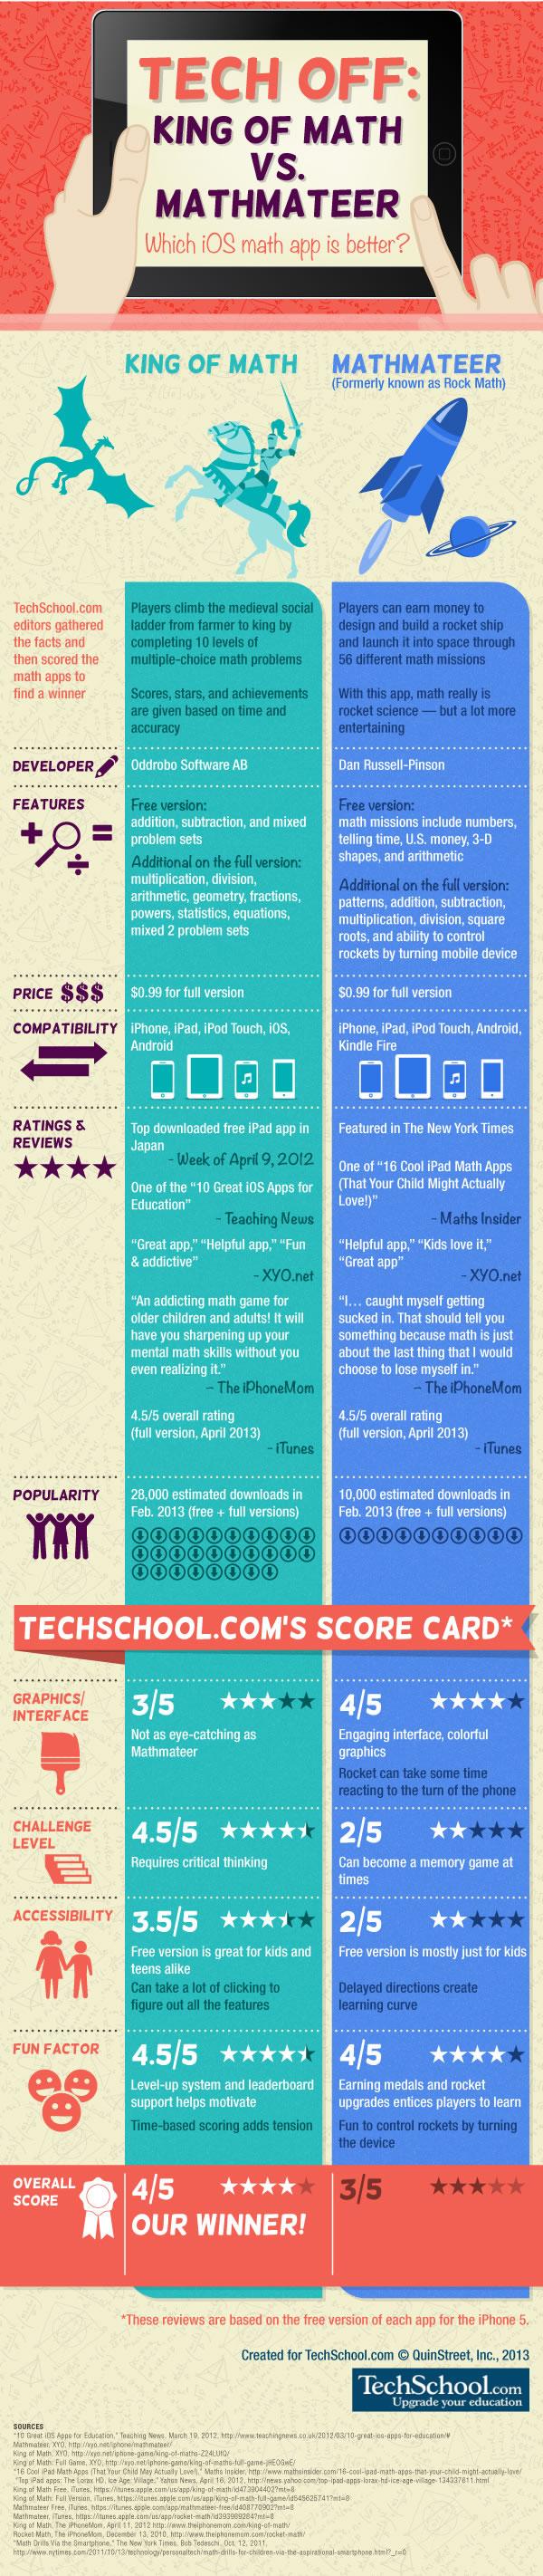 Tech off: king of Math vs. mathmateer